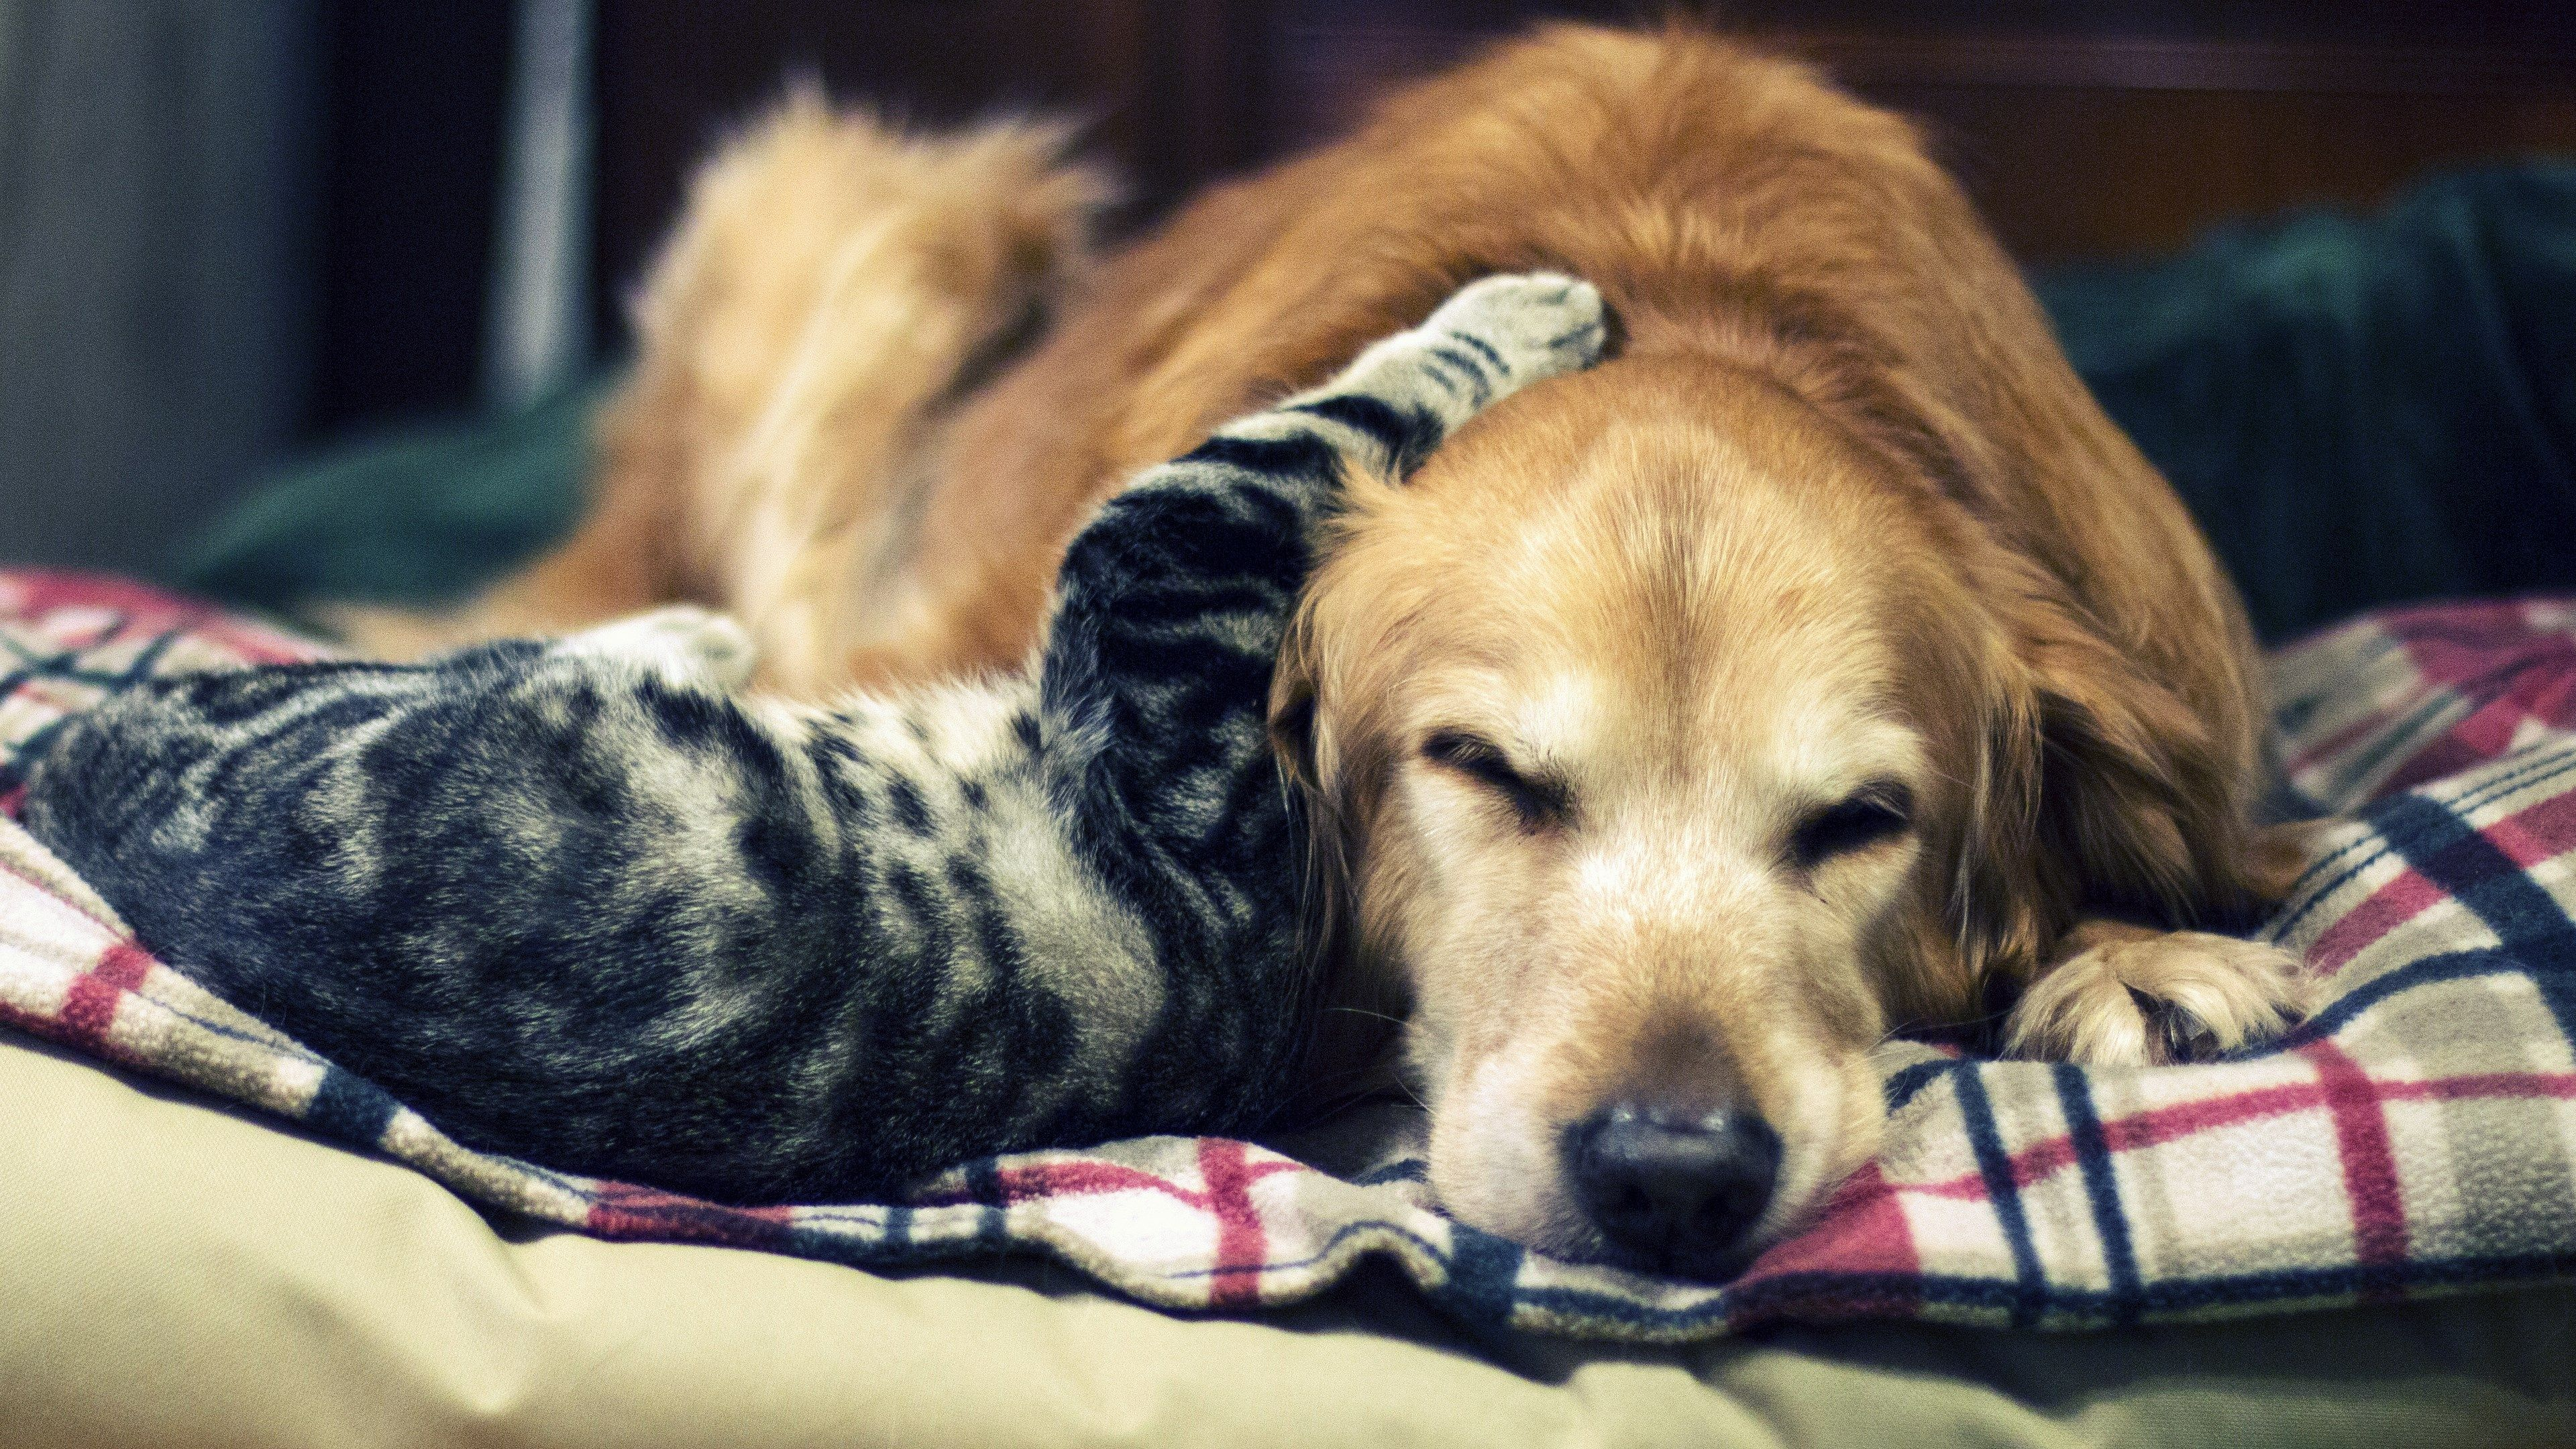 Cute Cat And Dog 4k Wallpaper For Desktop Ololoshenka Dogs Cats